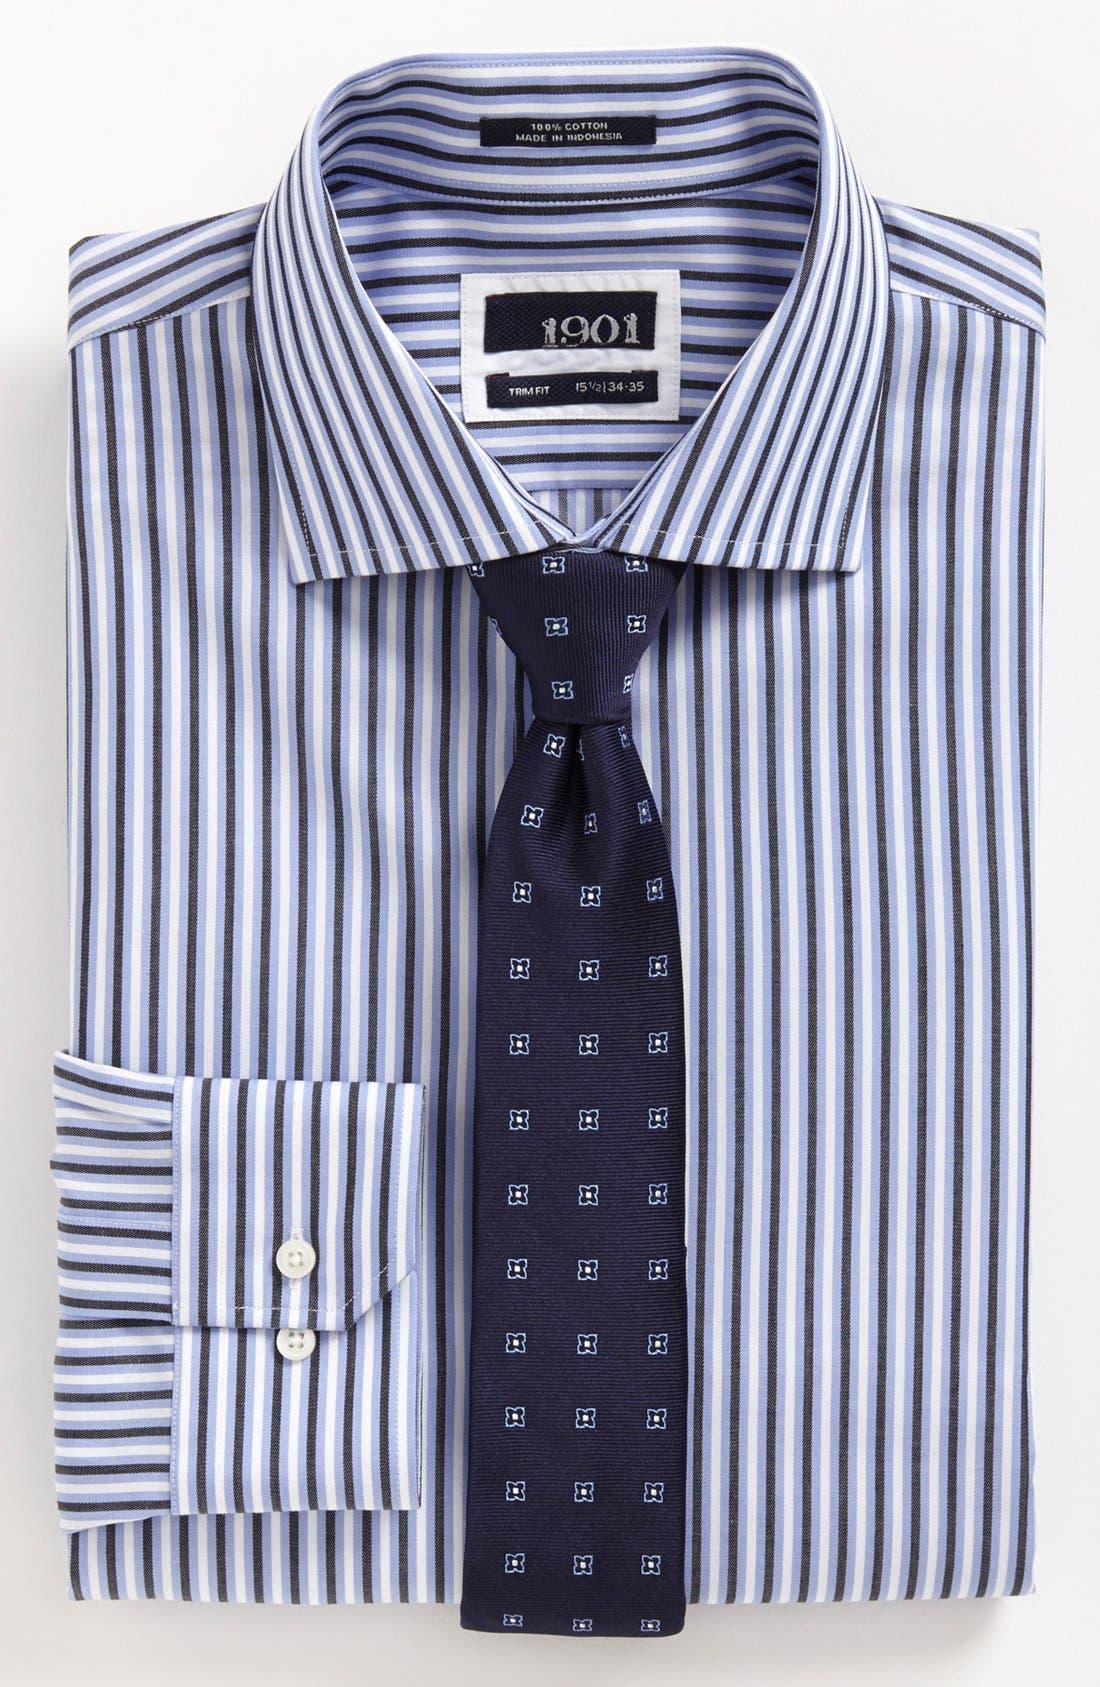 Main Image - 1901 Dress Shirt & Tie